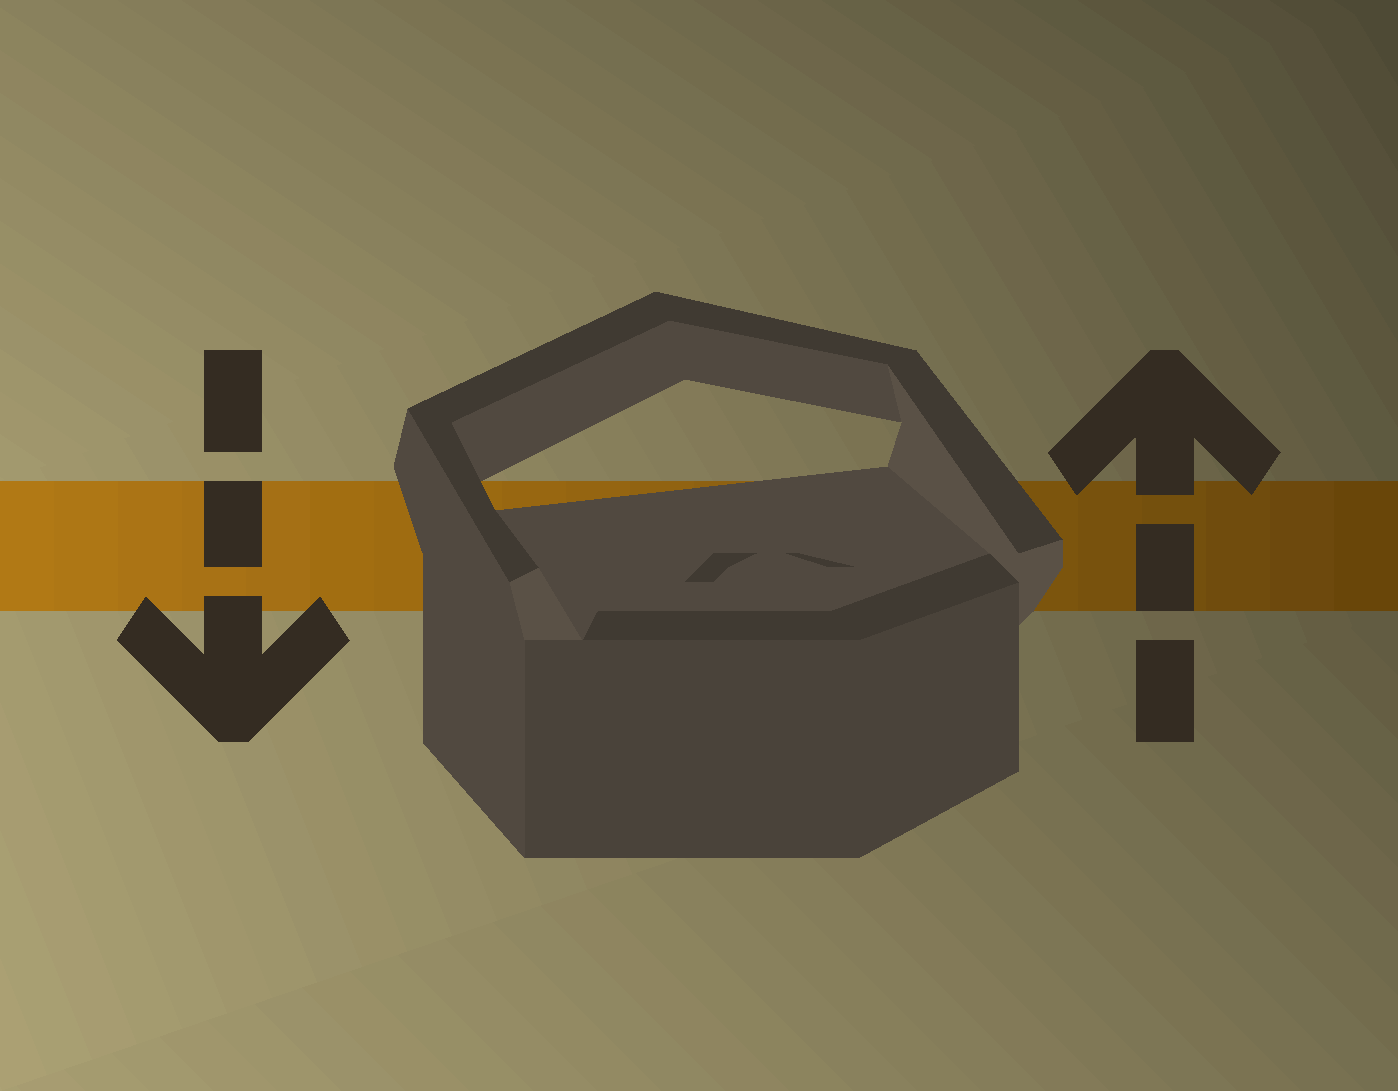 Teak Toy Box Flatpack The Old School Runescape Wiki